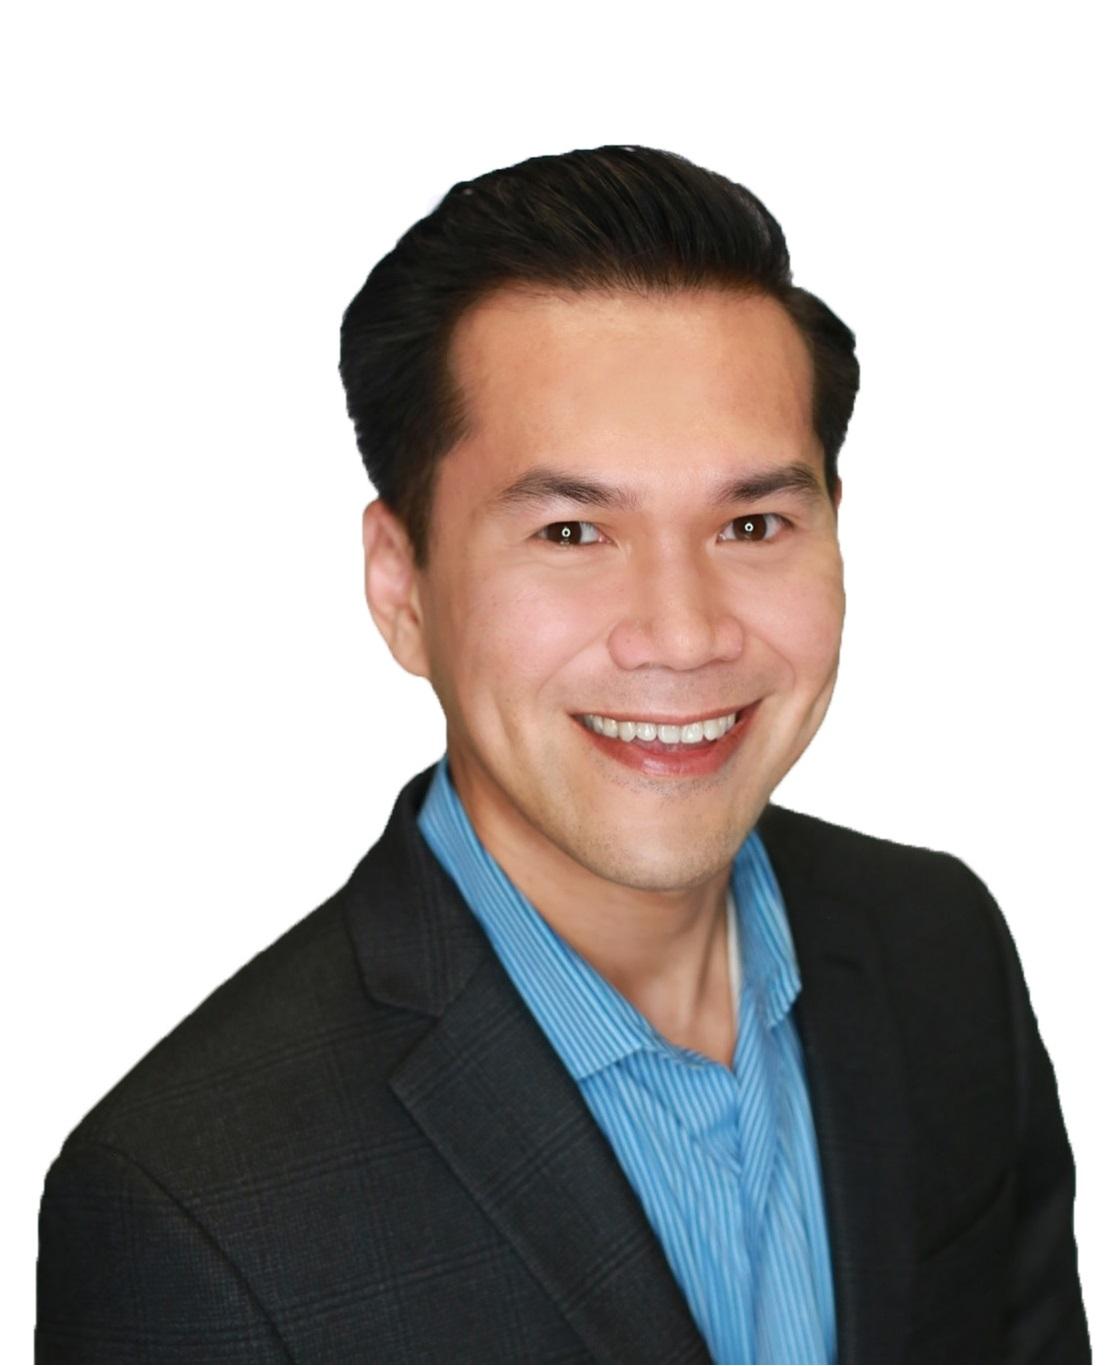 Landon Nguyen